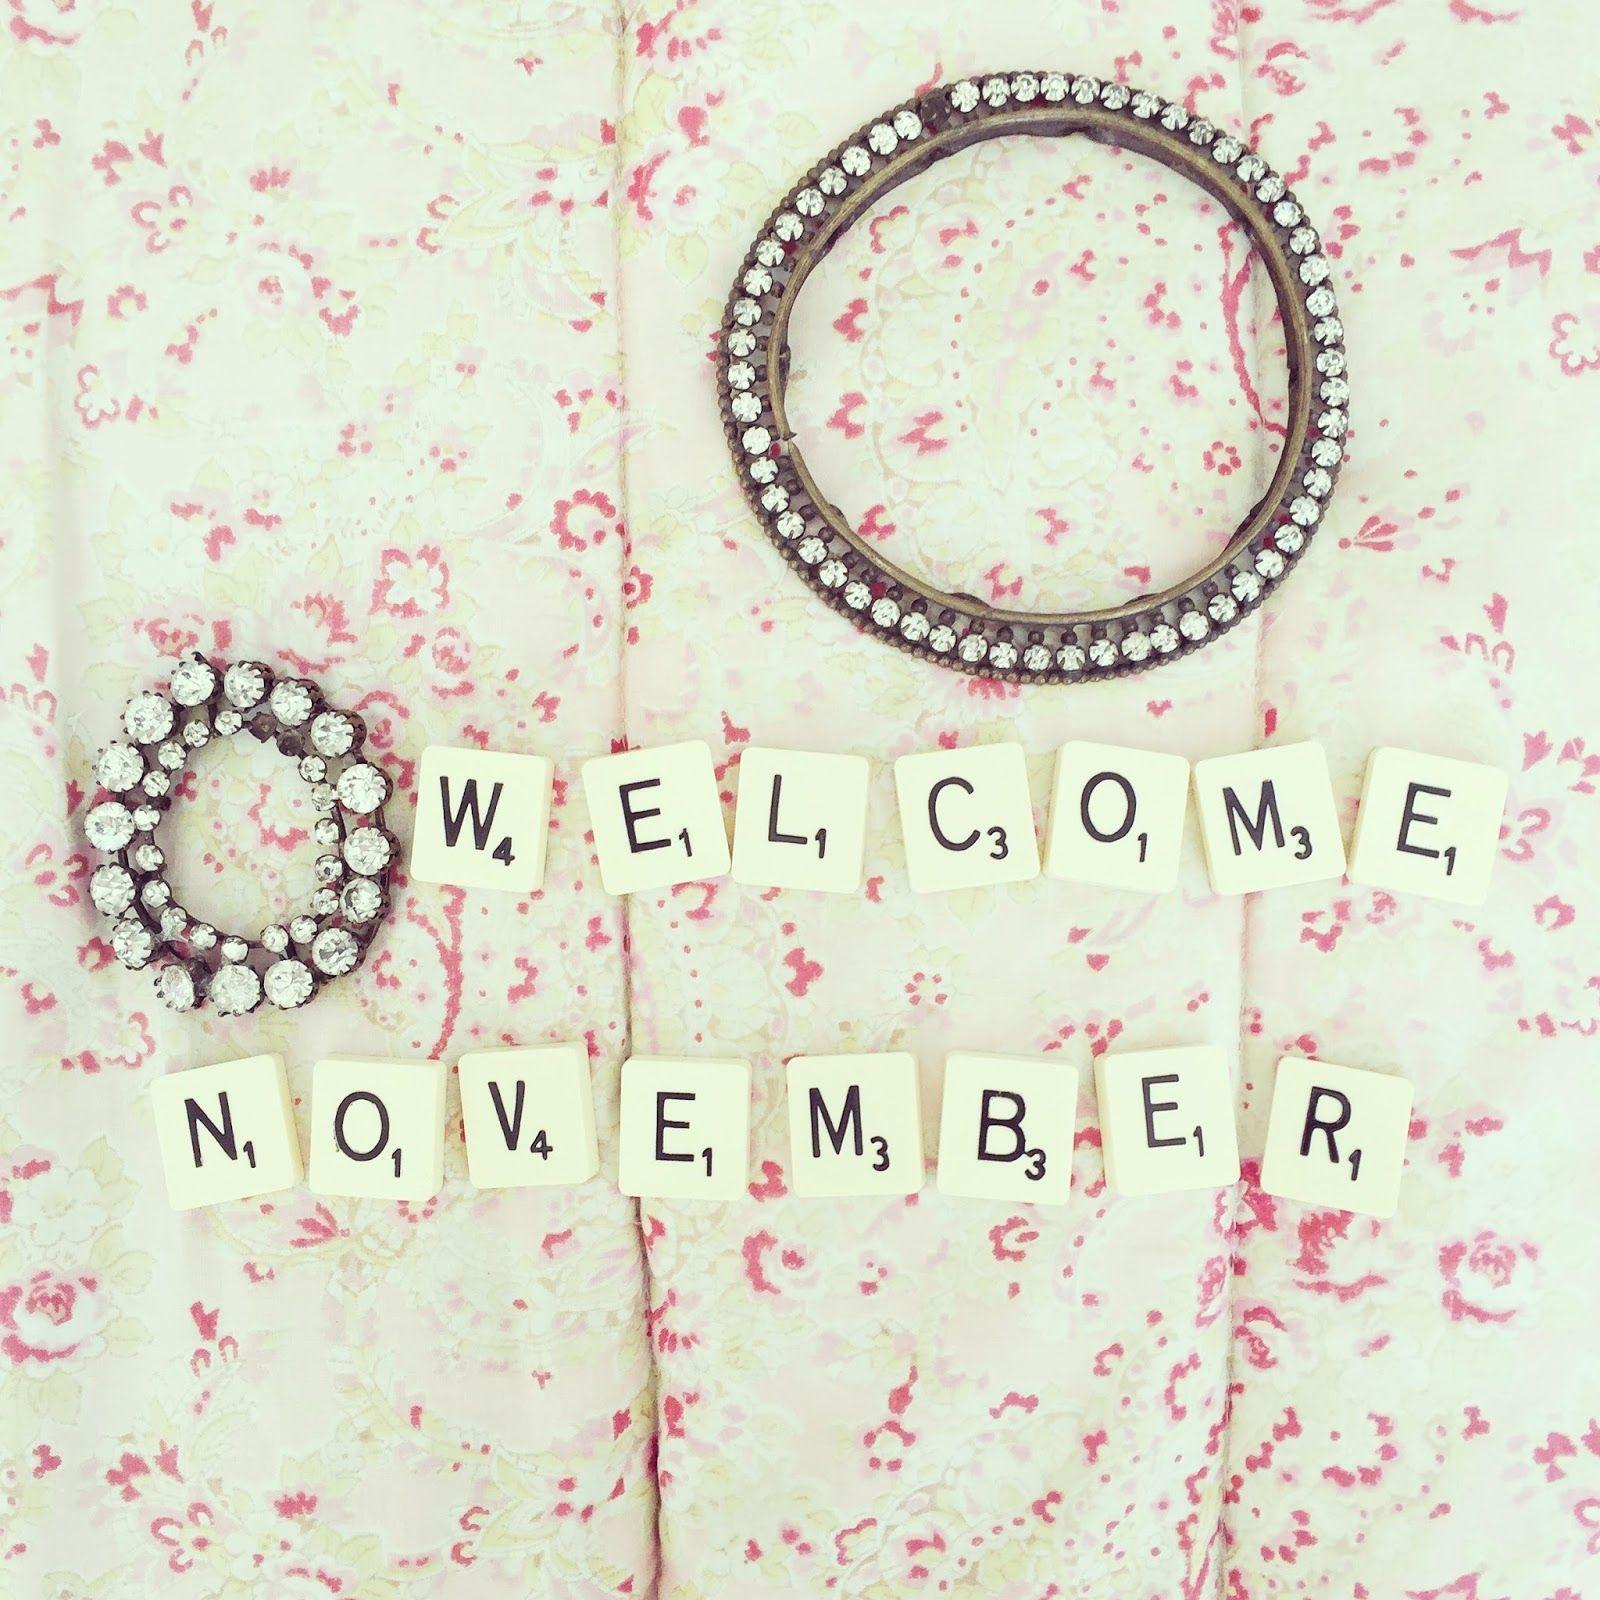 Welcome November #welcomenovember Welcome November #welcomenovember Welcome November #welcomenovember Welcome November #hellonovemberwallpaper